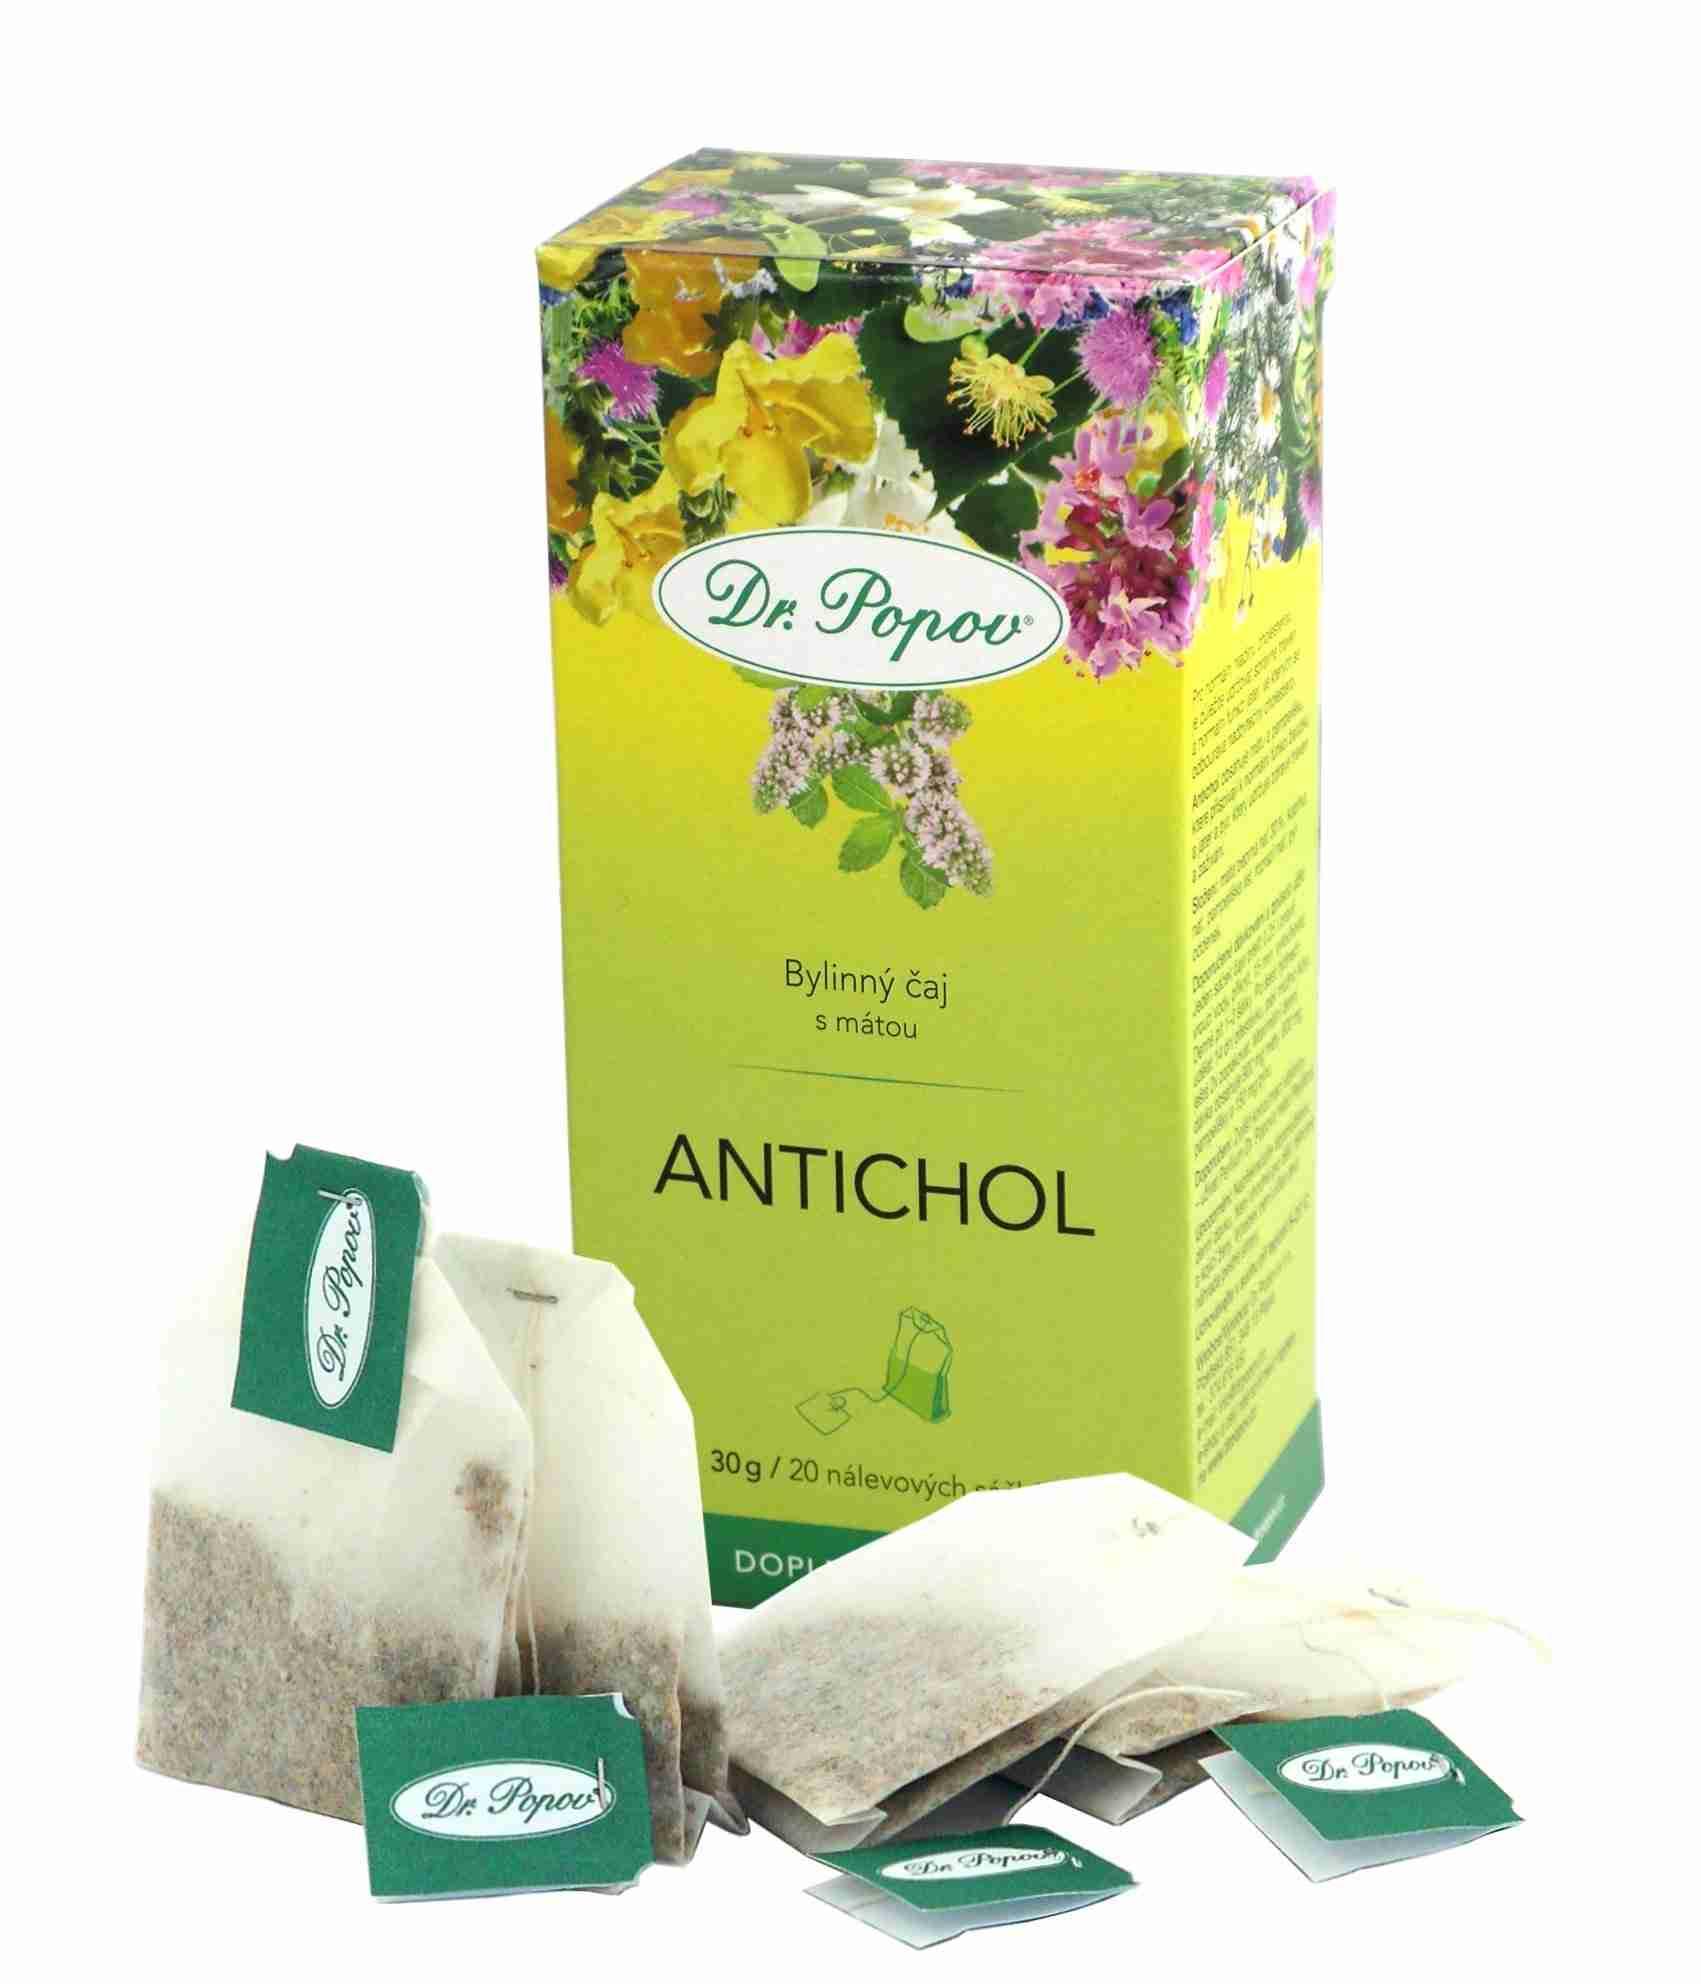 Dr. Popov Antichol tea 20 n.s.